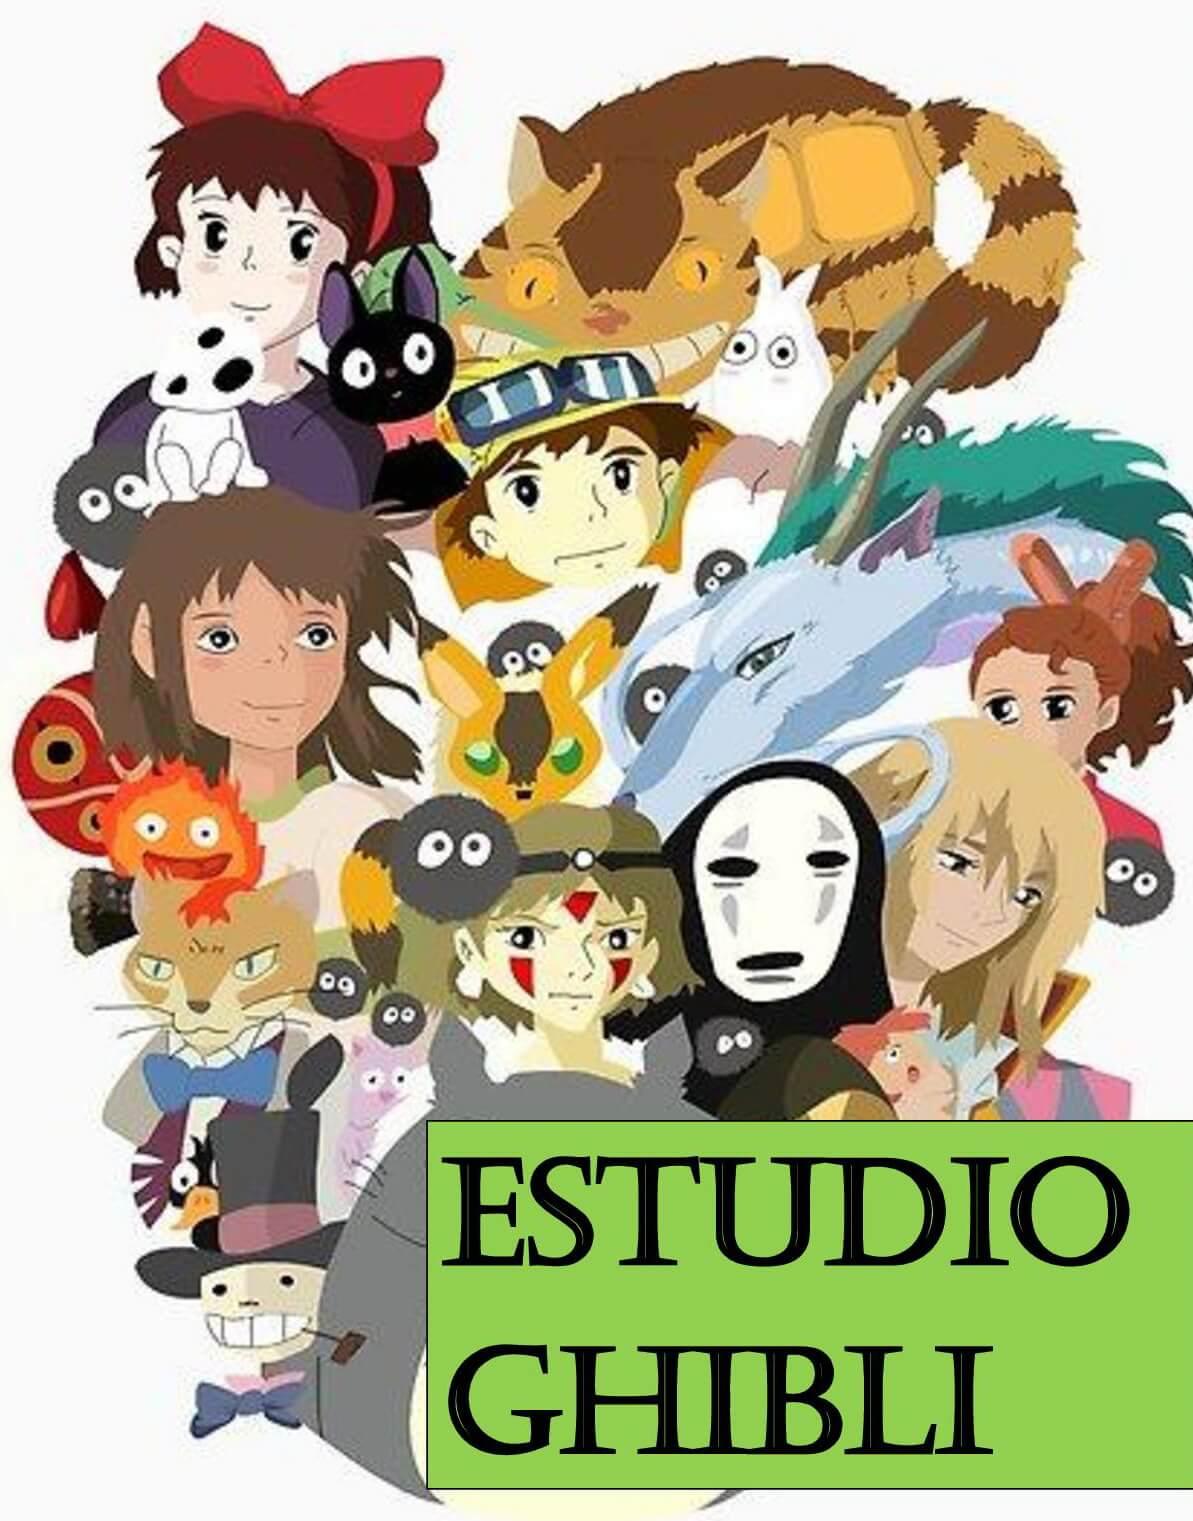 Estudio Ghibli - Mitaka